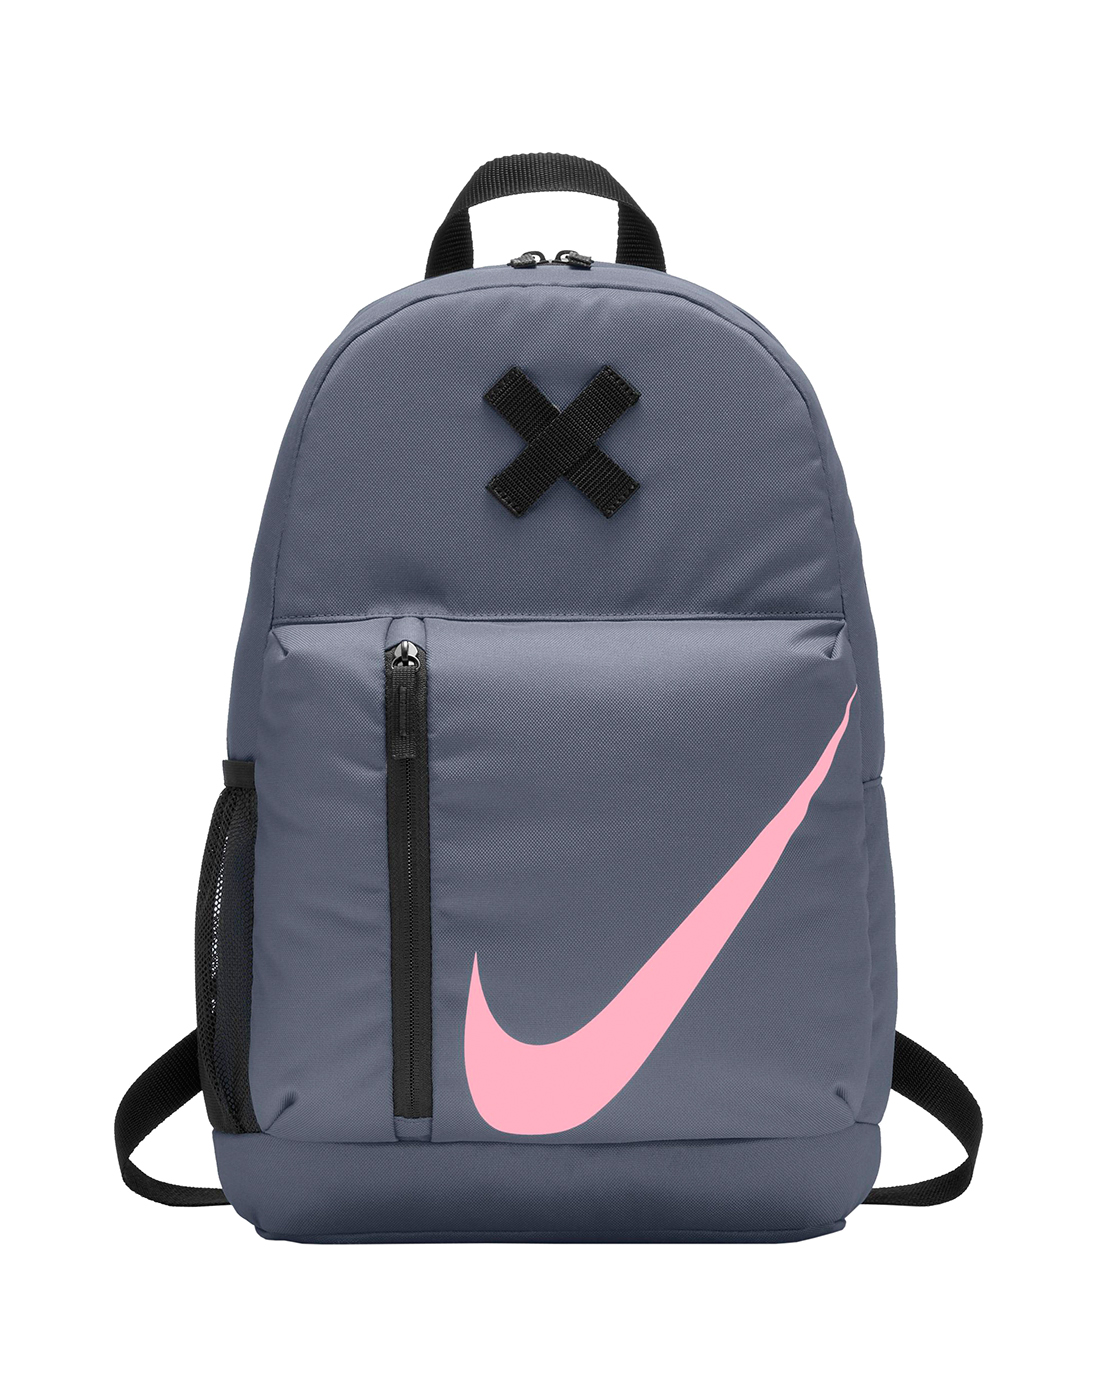 d9af53cbcec Grey & Pink Nike School Bag | Life Style Sports